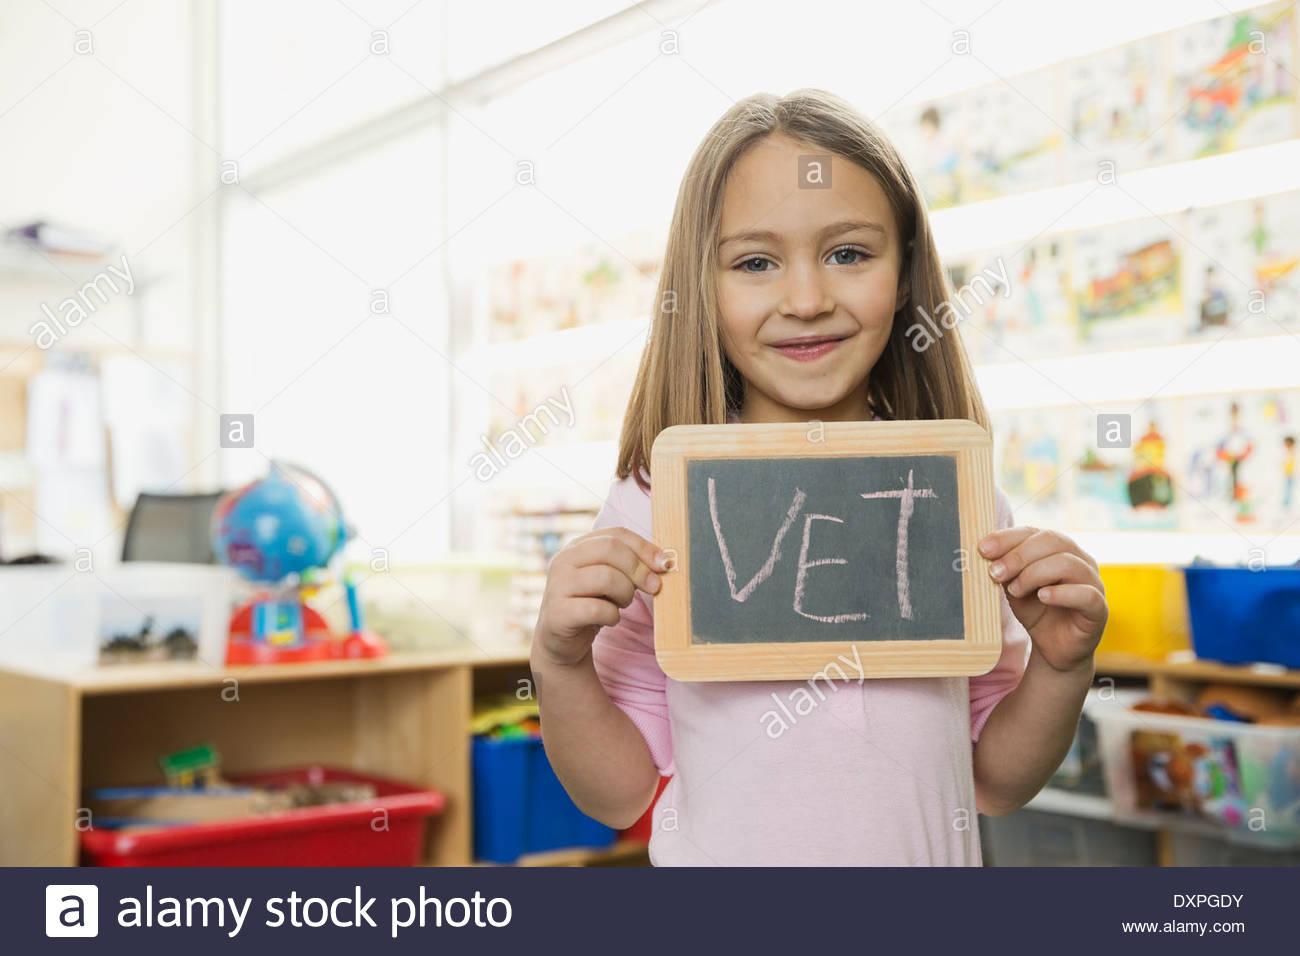 Portrait of girl holding slate with 'Vet' written on it - Stock Image